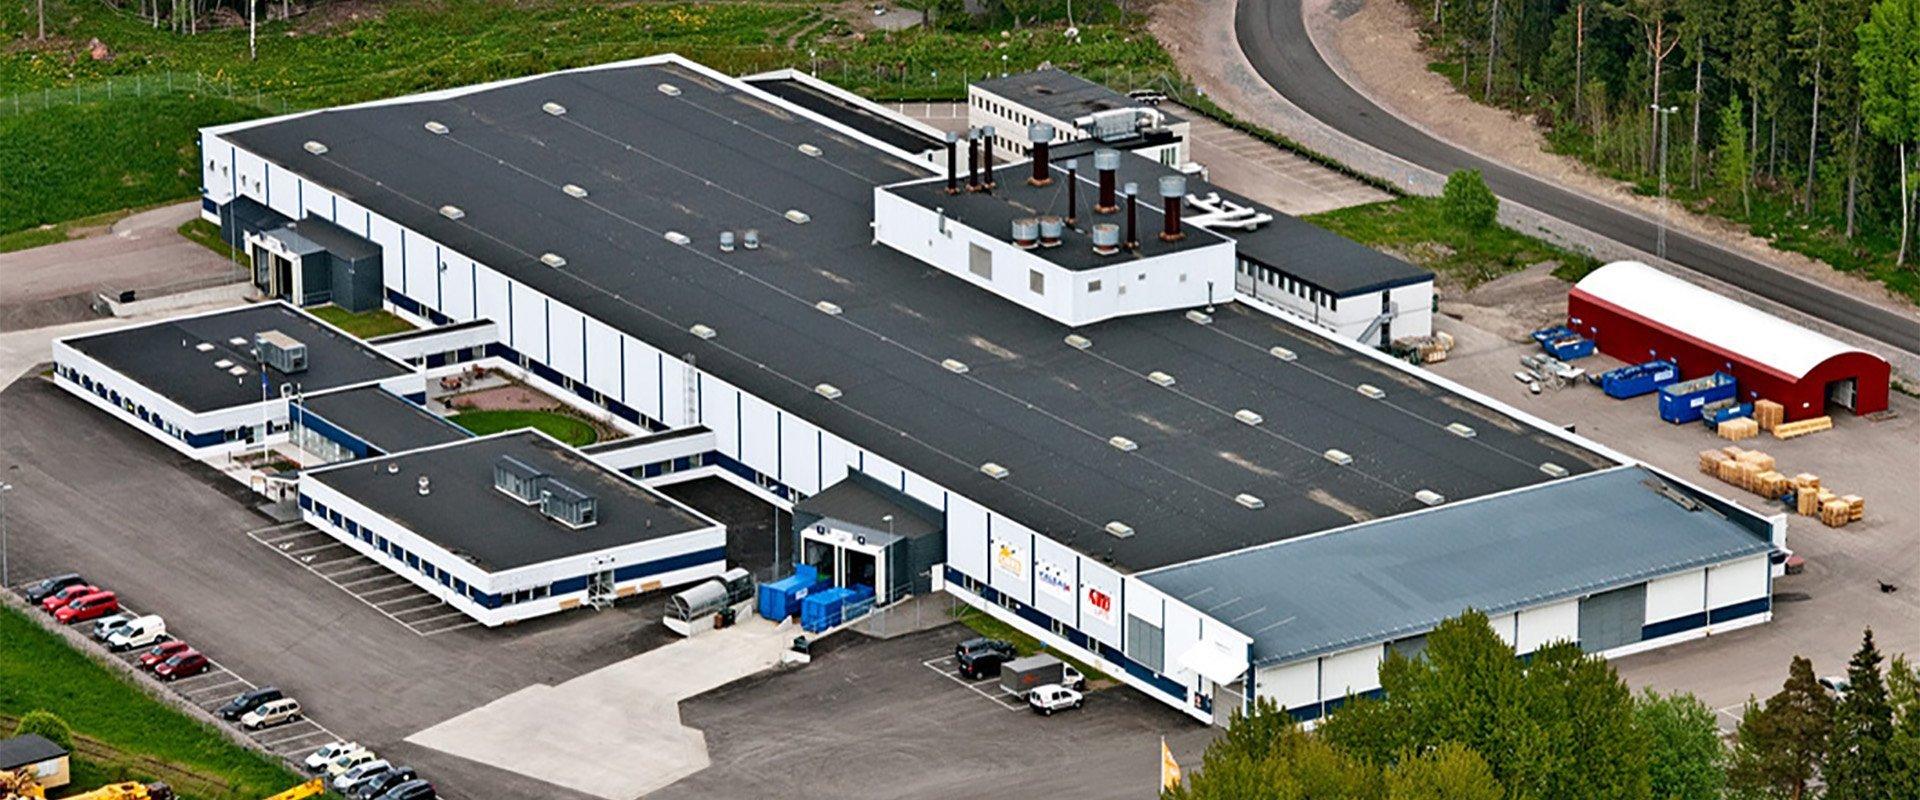 cibes factory aerial shot